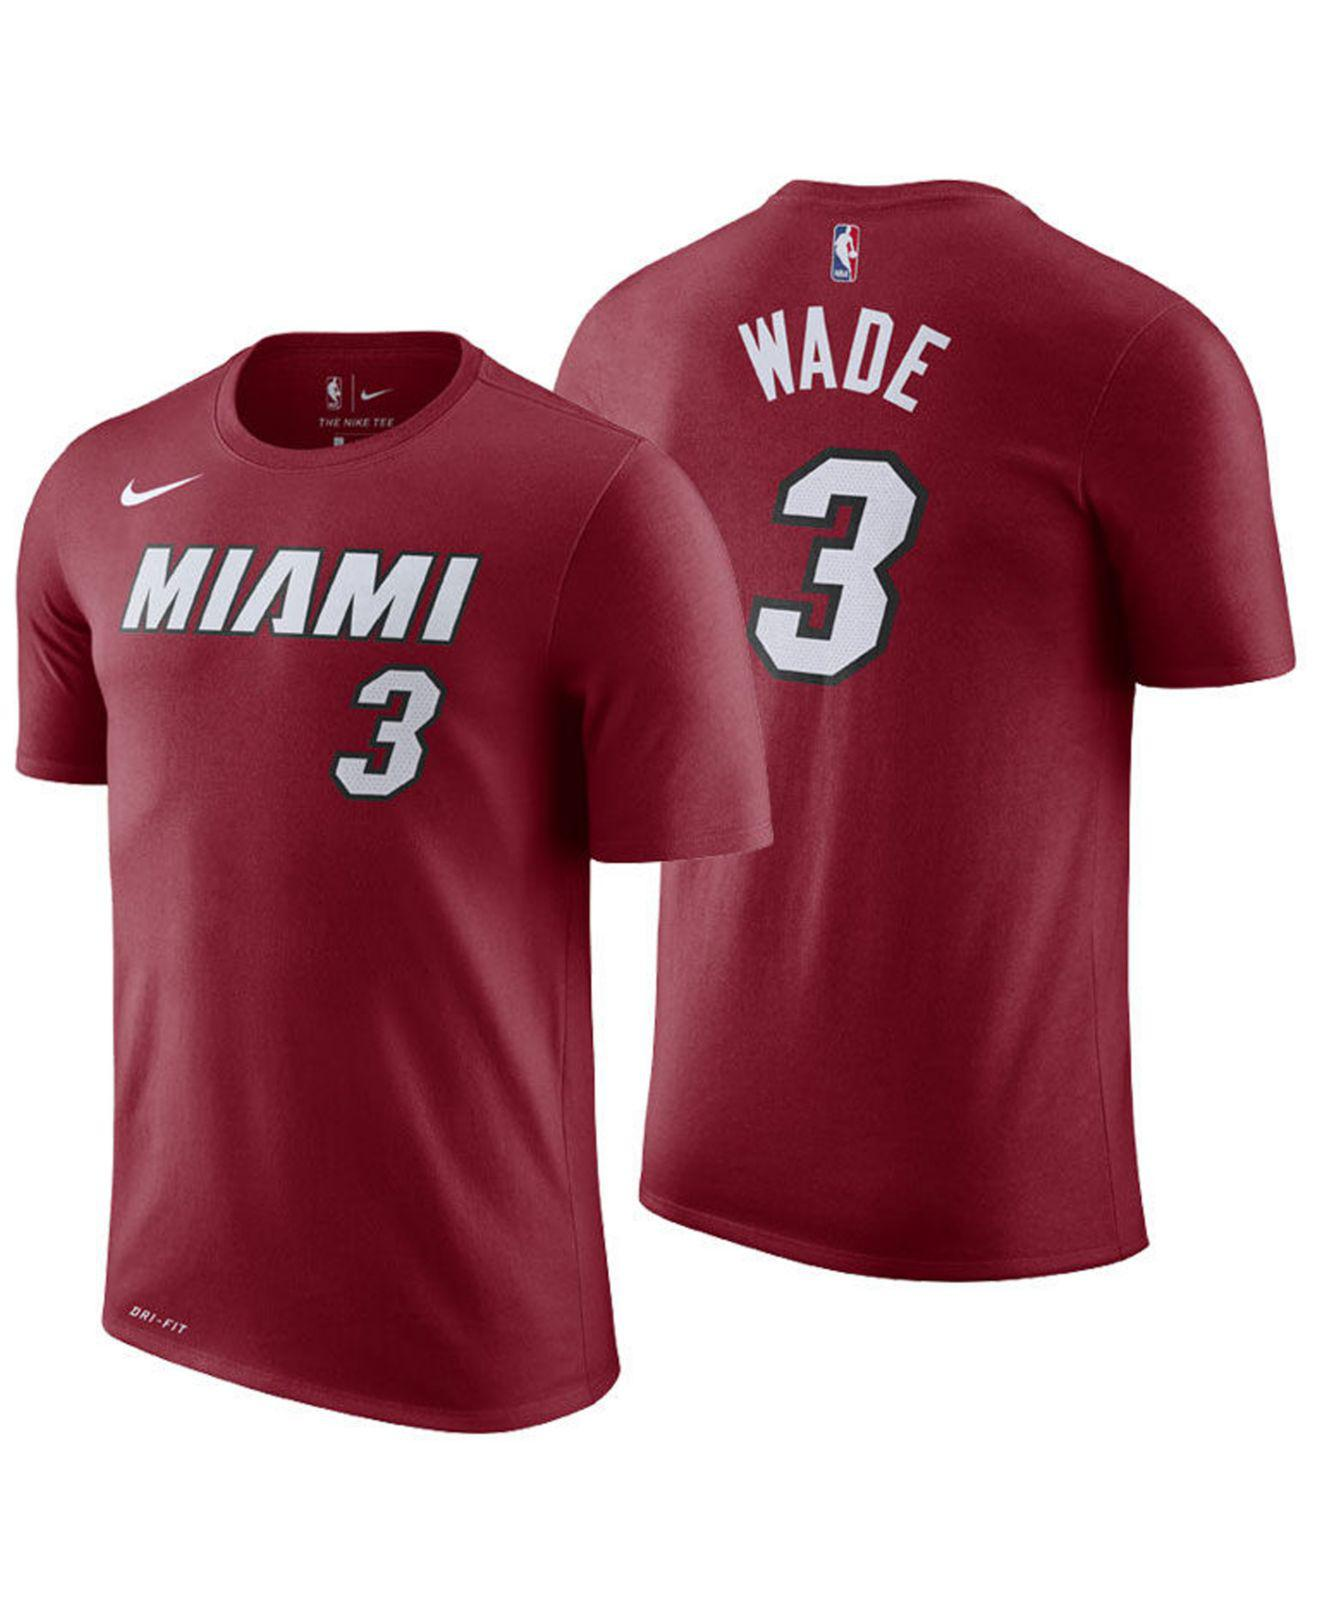 competitive price 186c8 9d6f2 amazon miami heat sleeve jersey e5d56 75207